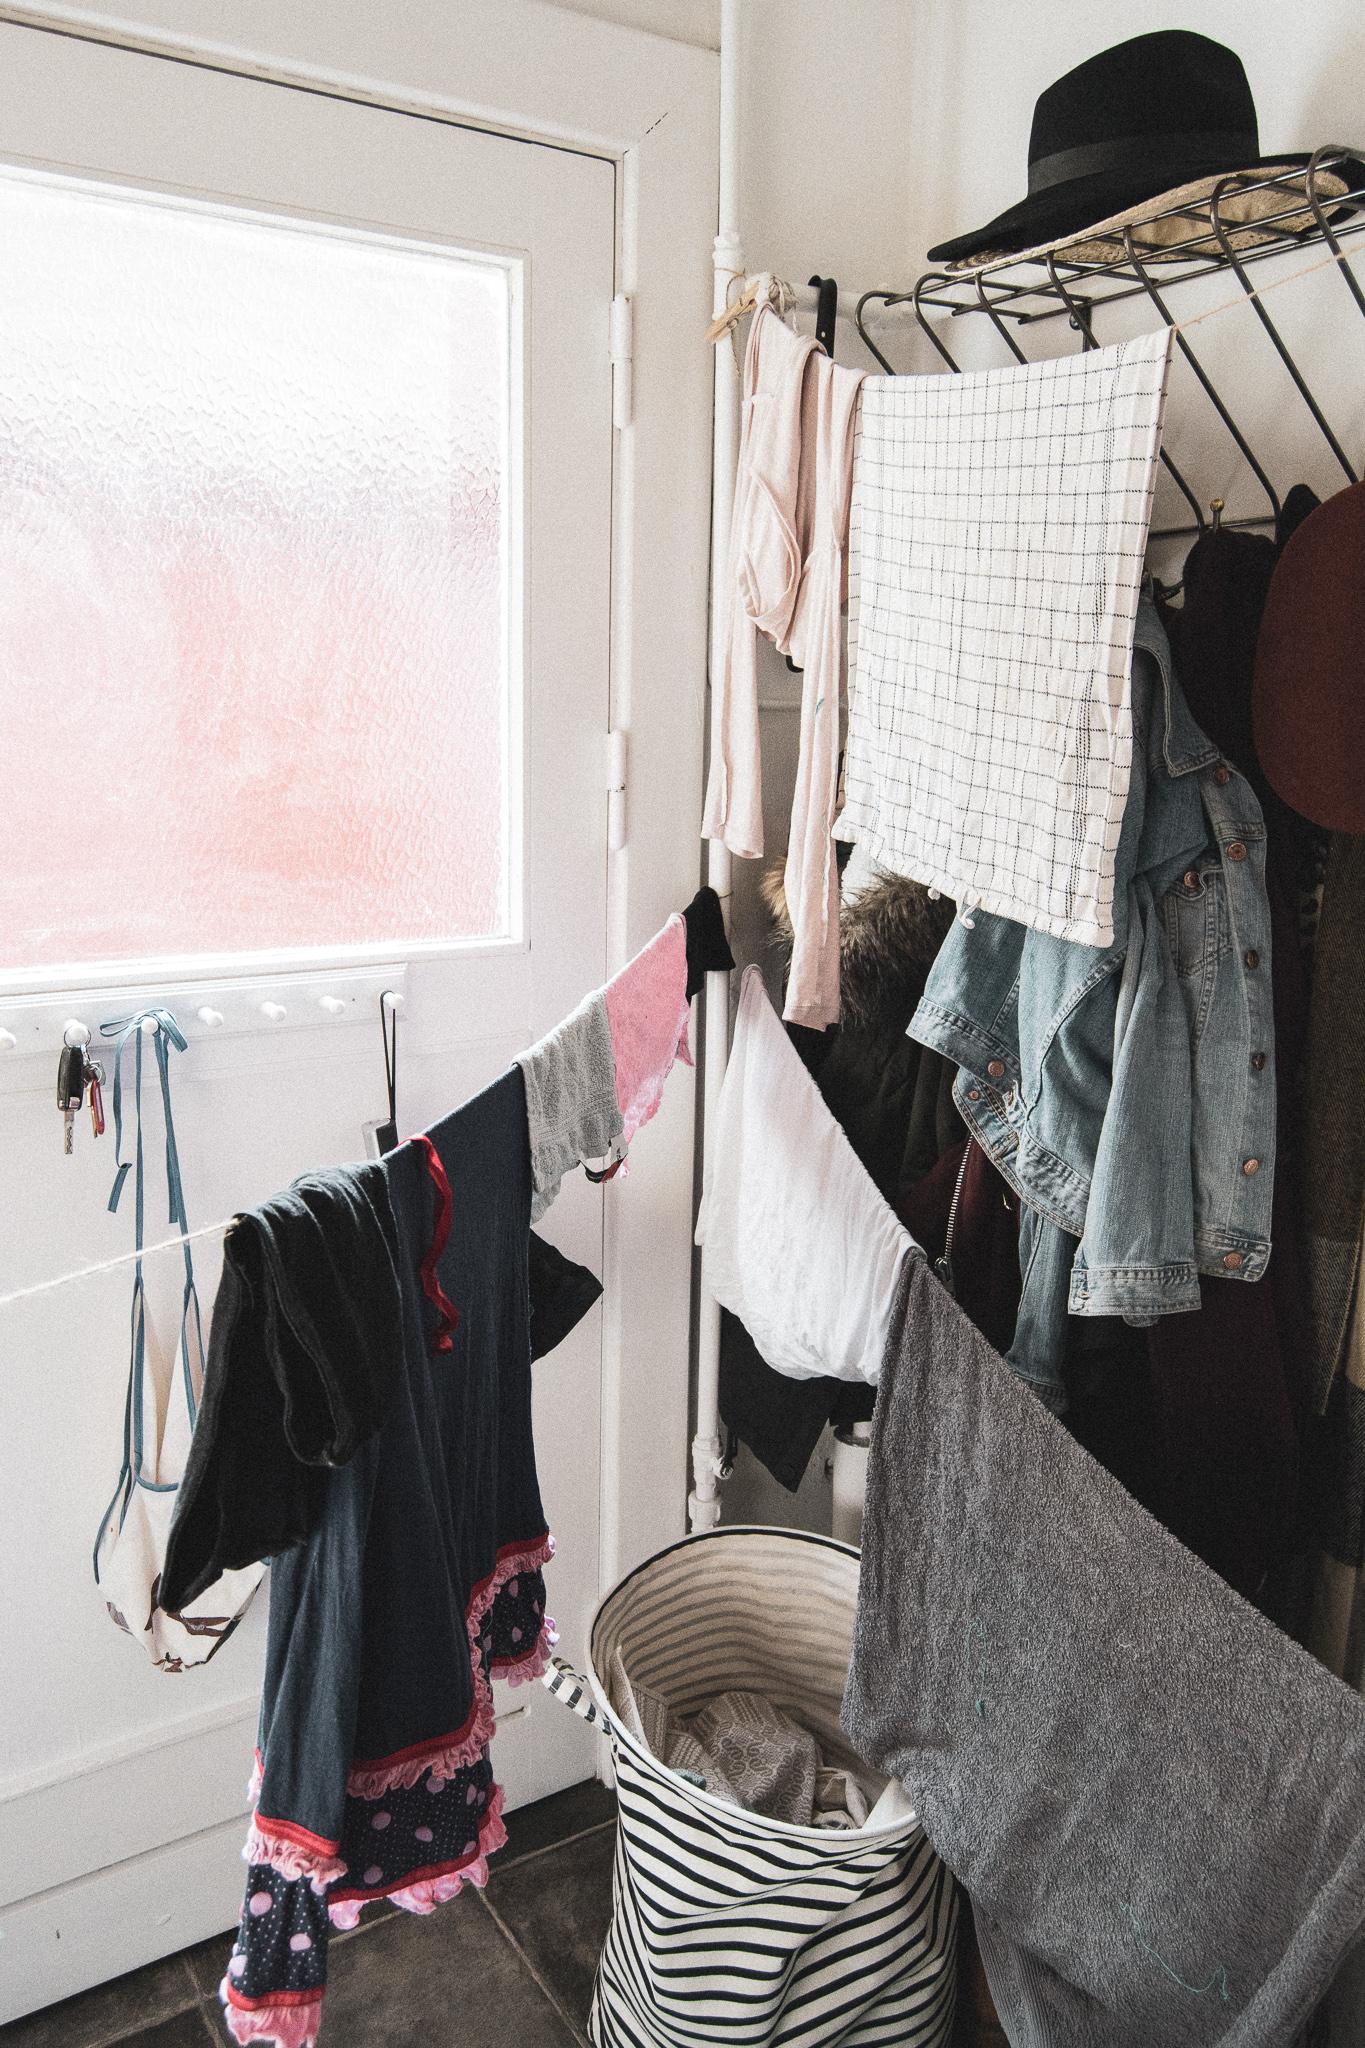 drying clothes, tørretøj, tøjsnor, bryggers